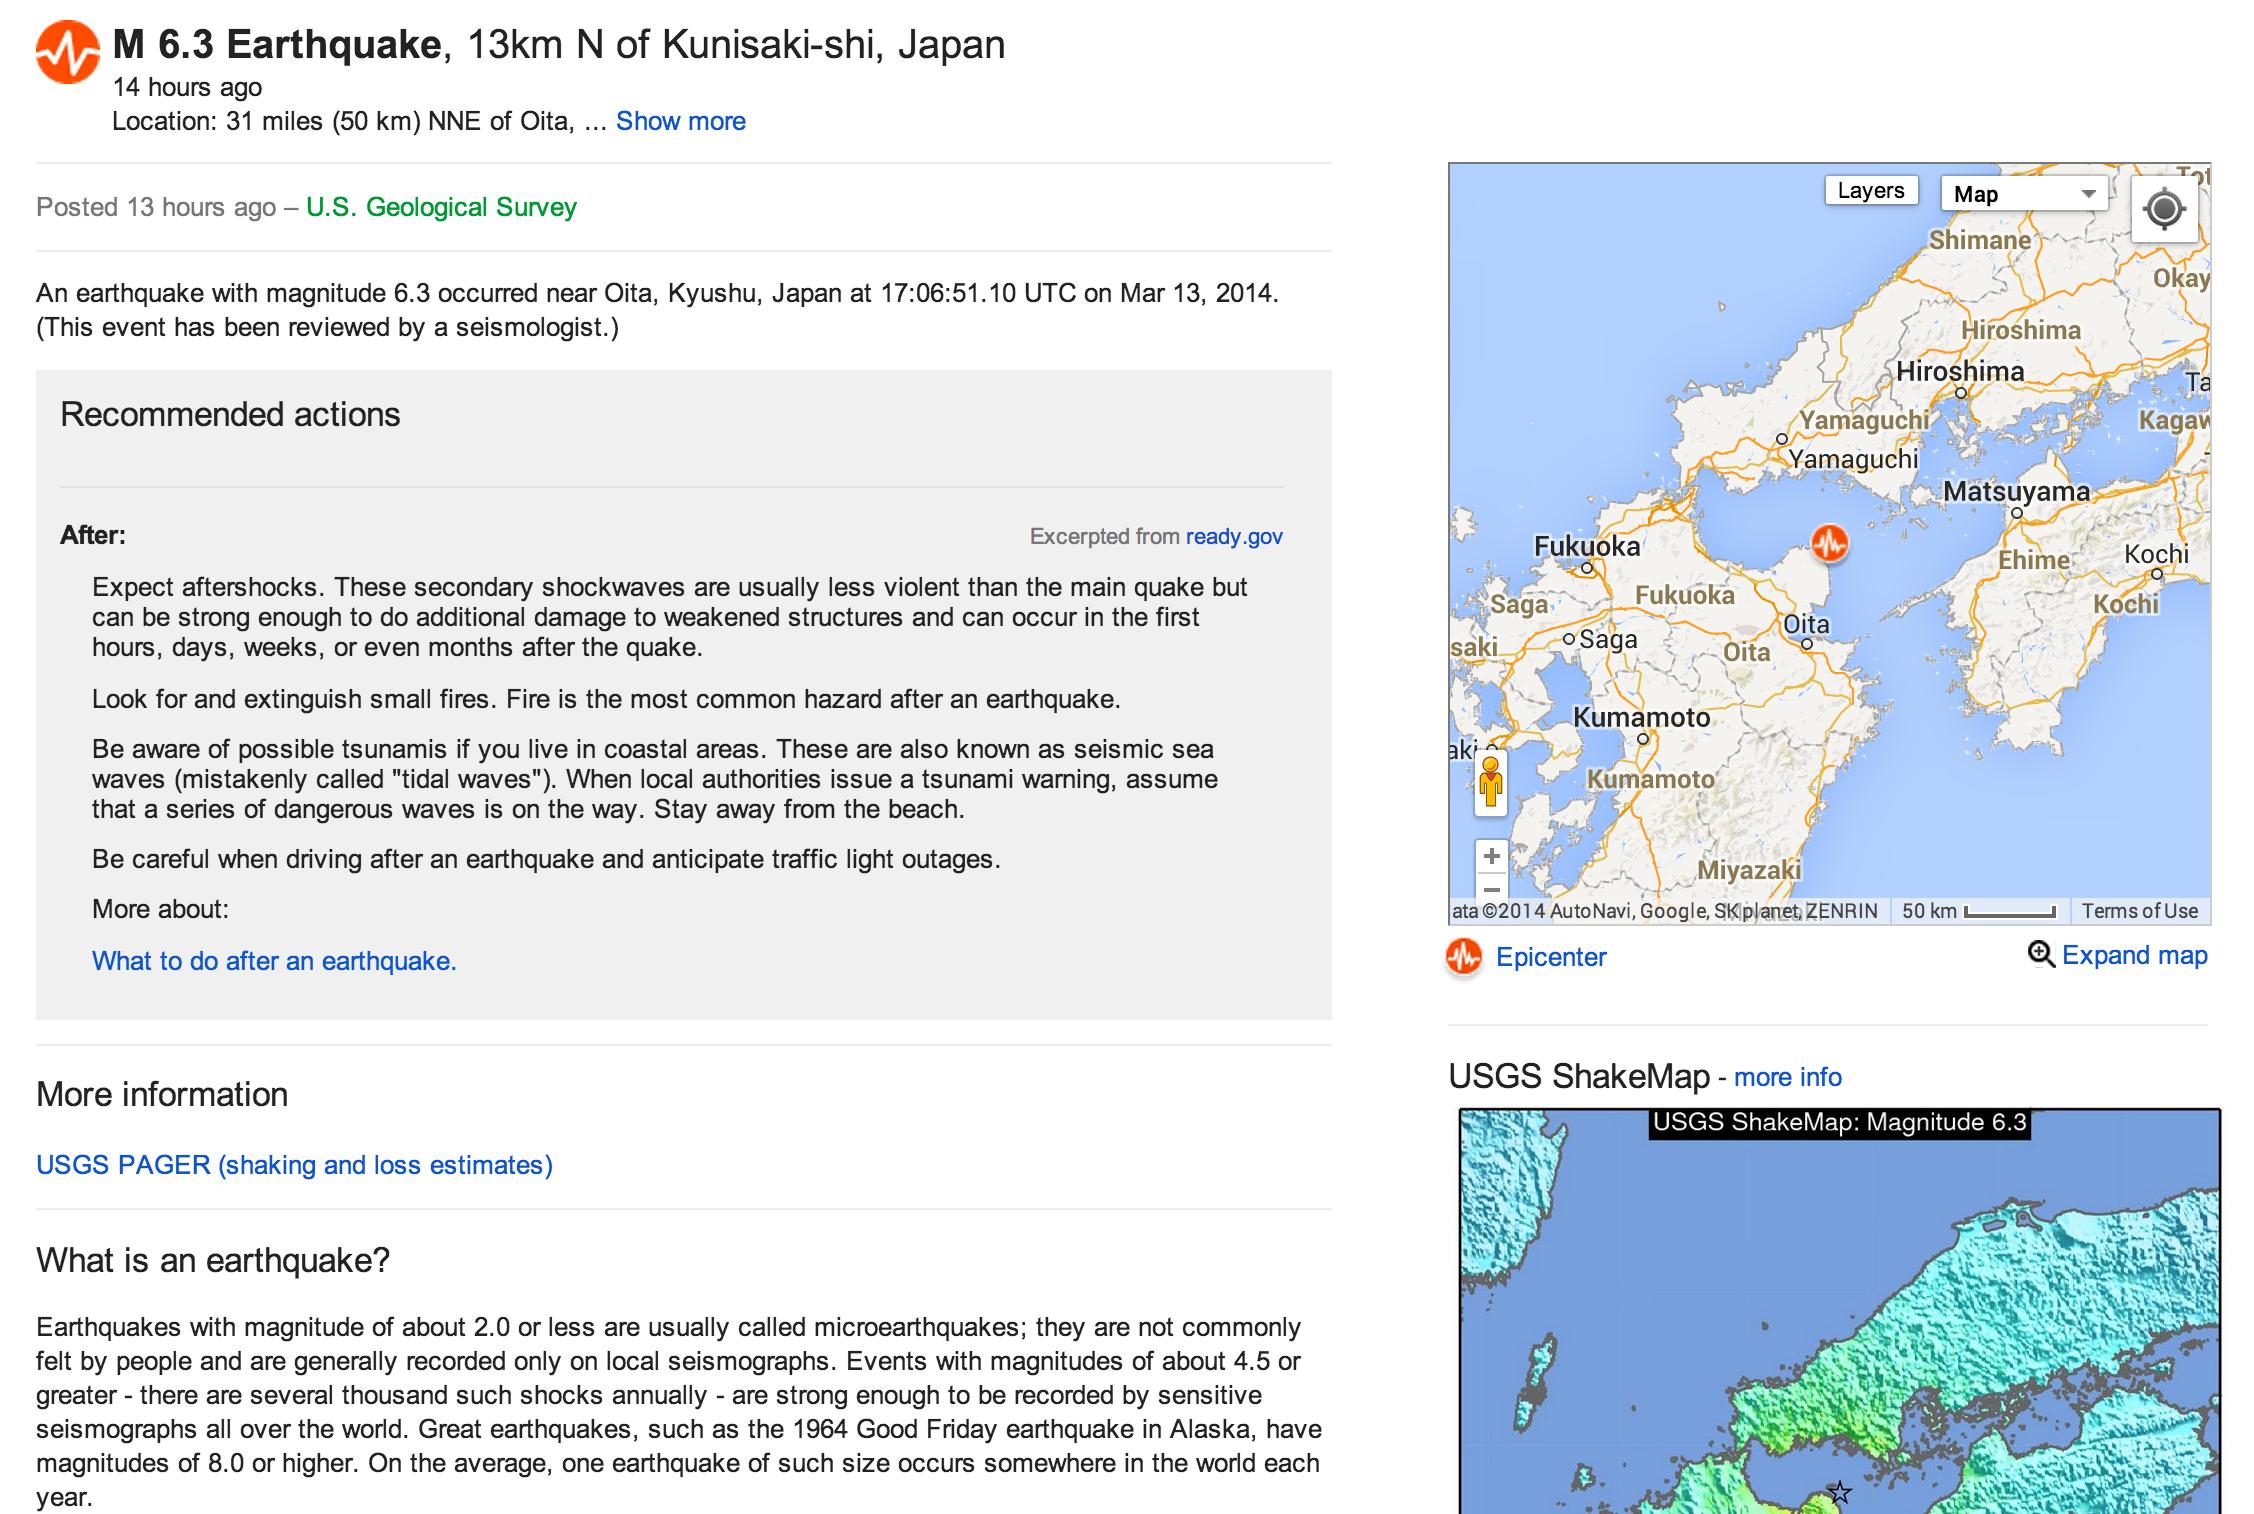 Earthquake near Hiroshima, Japan